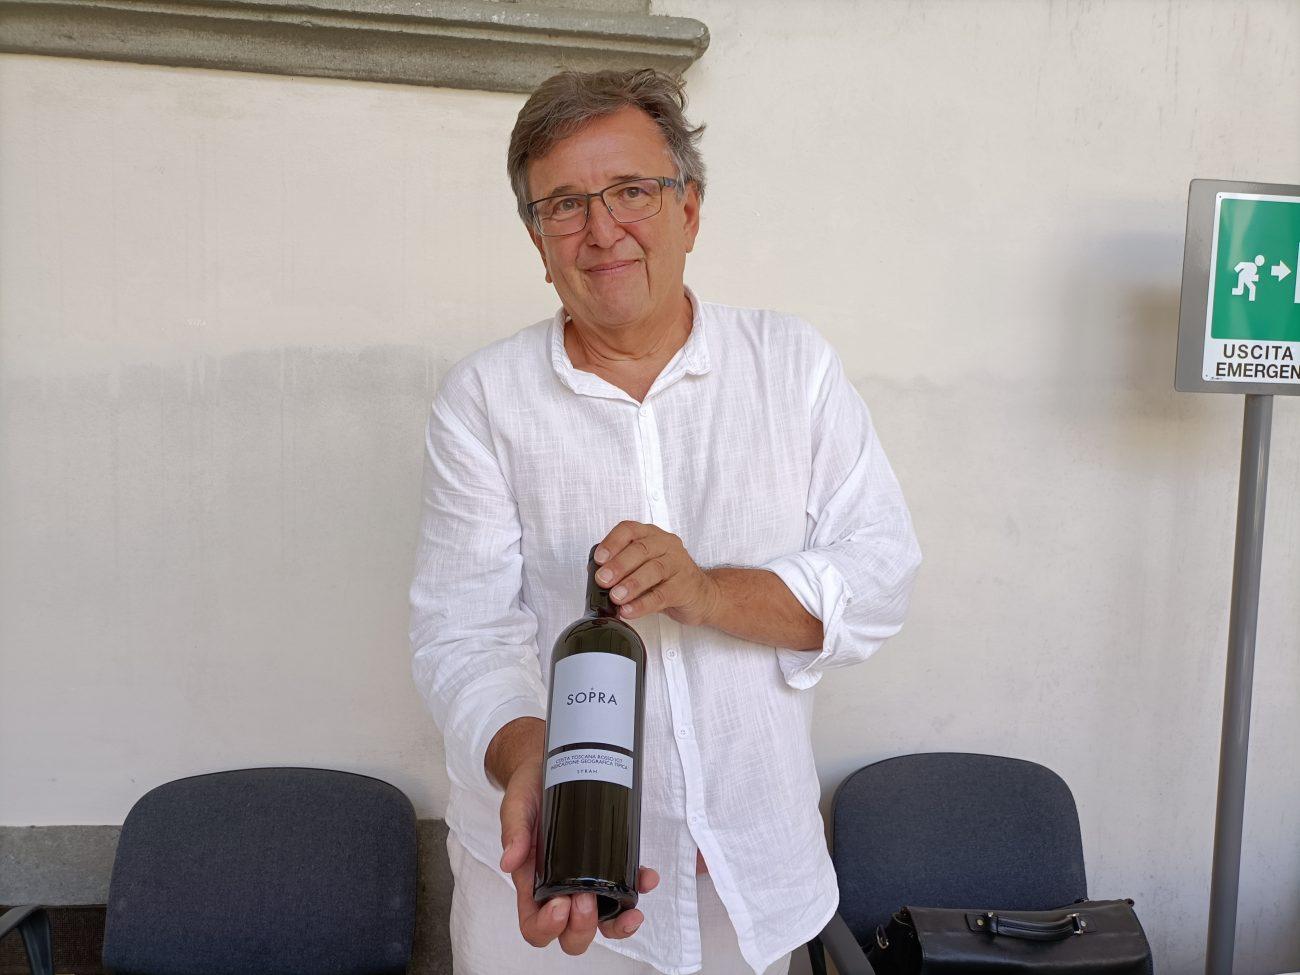 Ulrich Ziegler di Colline di Sopra migliori assaggi all'Anteprima Grandi Cru della Costa Toscana 2021